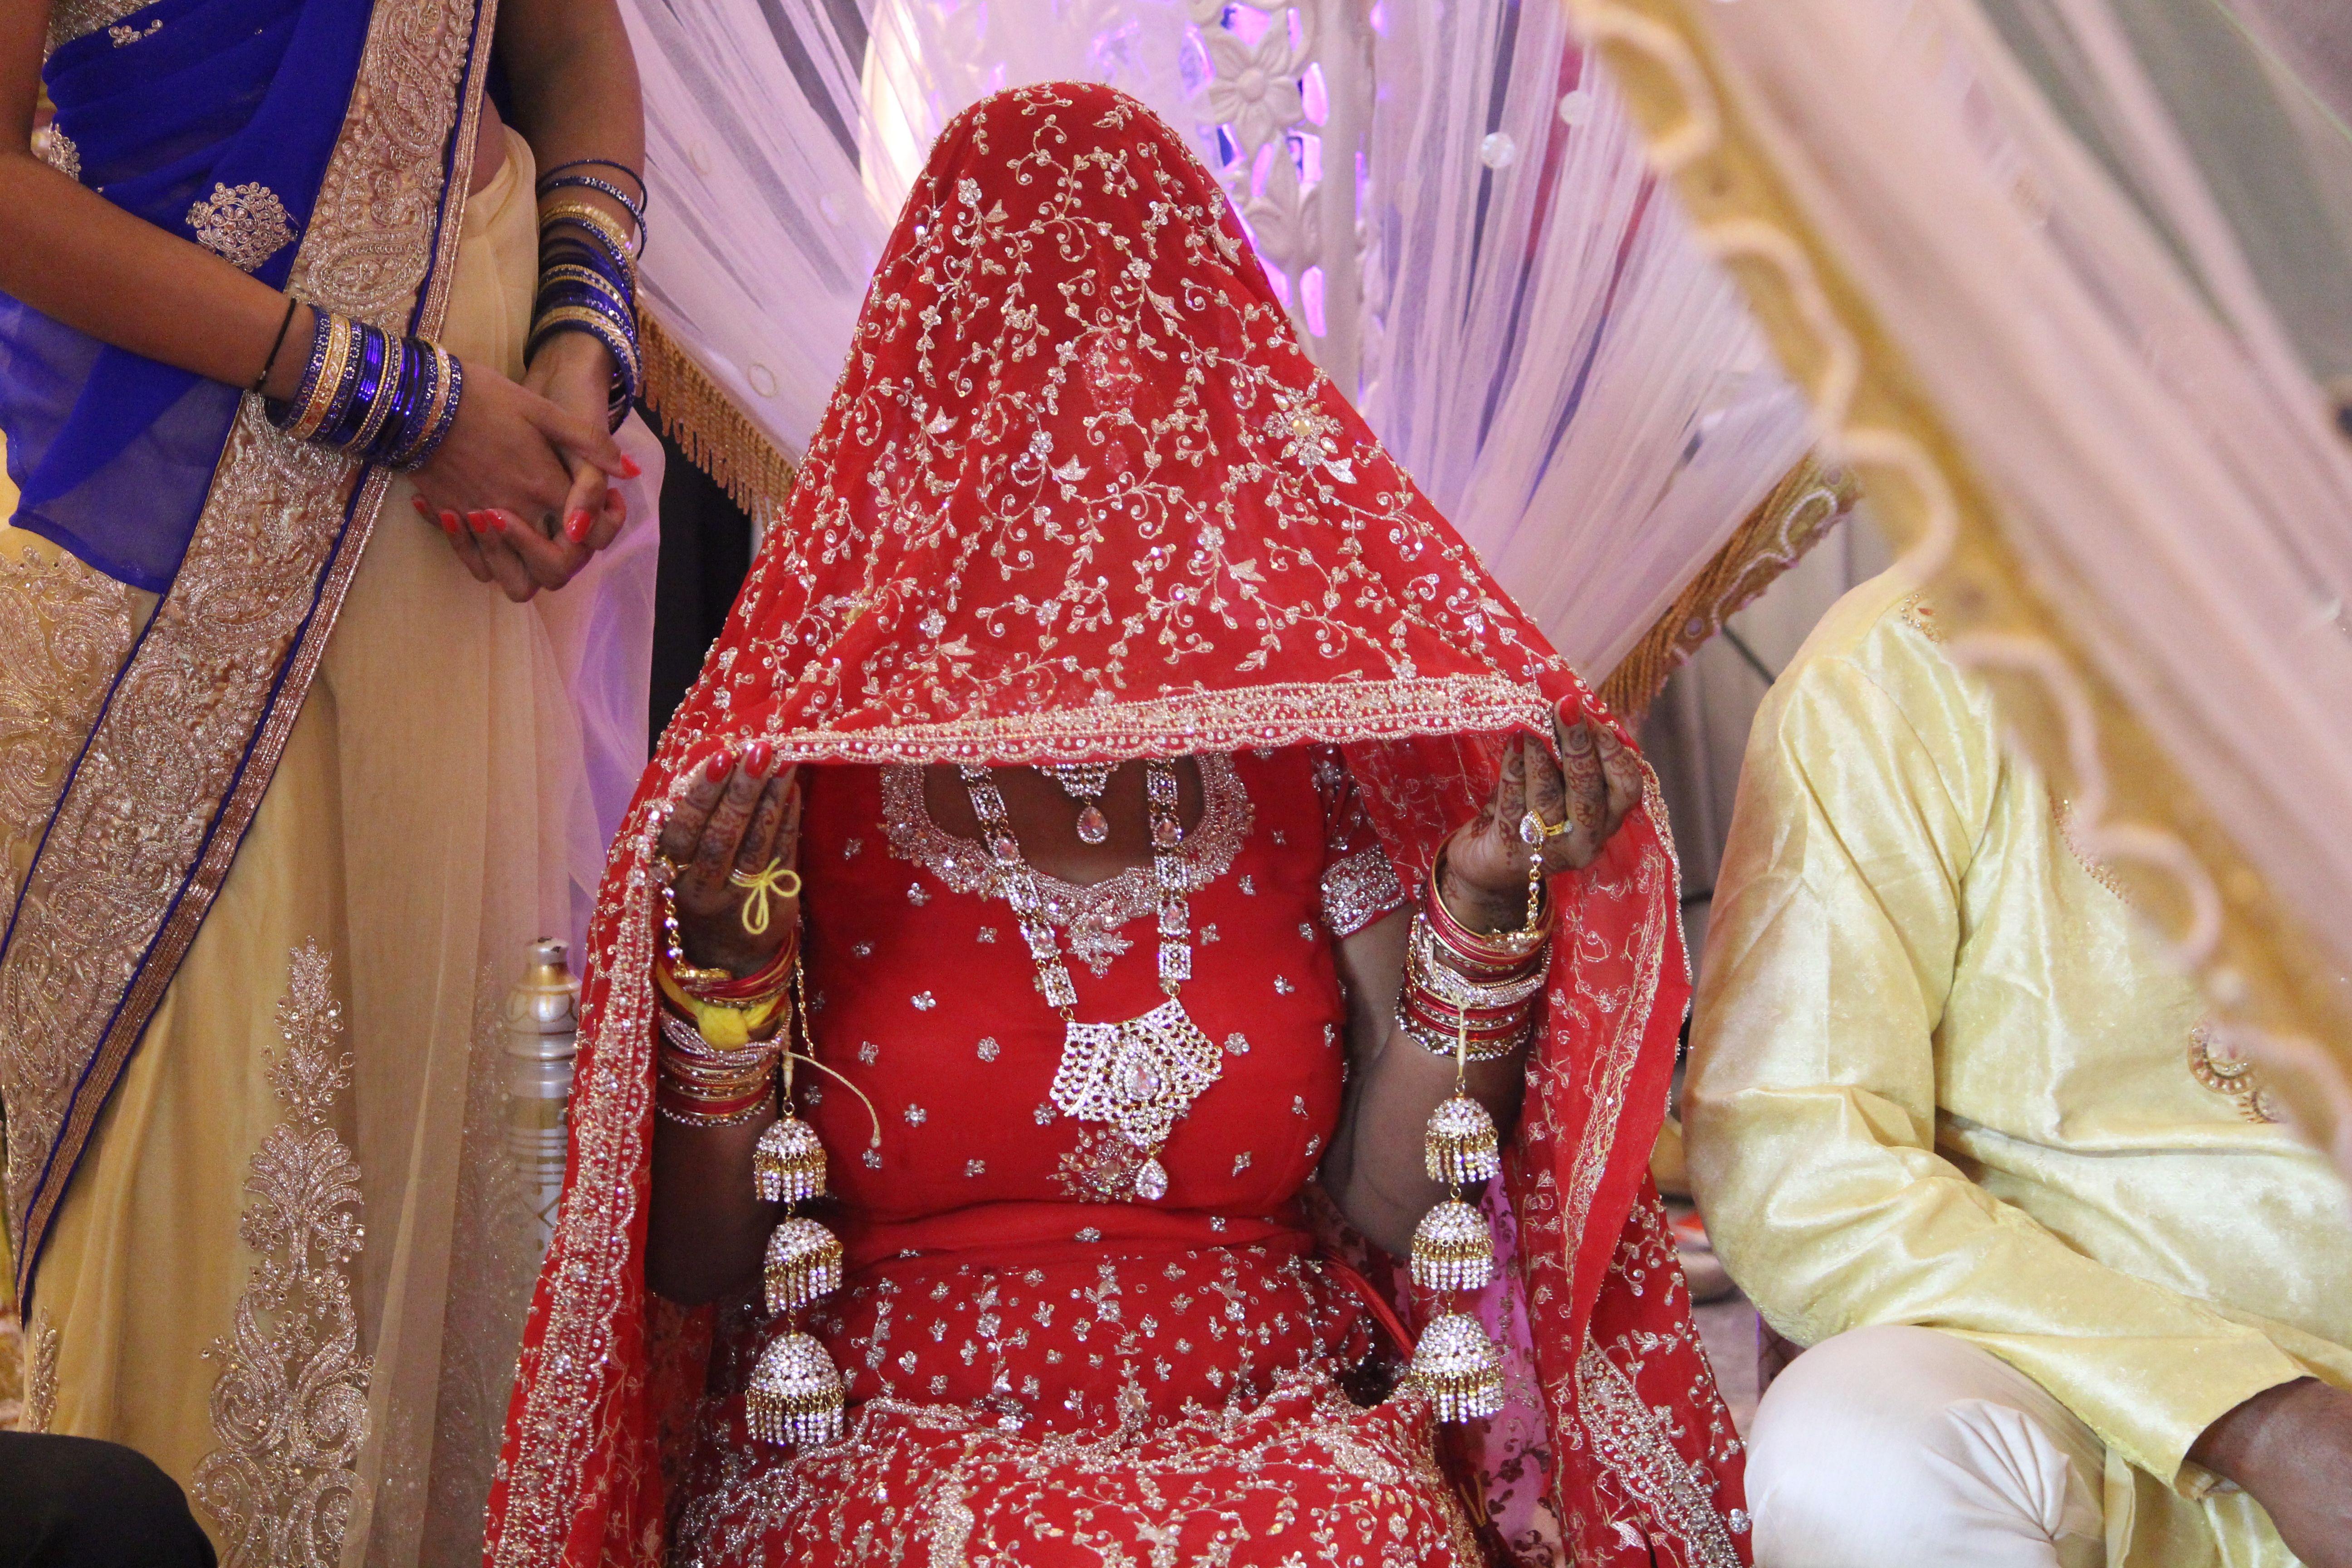 Zaterdag 12 september 2015, Almere. Bruid op Hindoestaanse bruiloft.